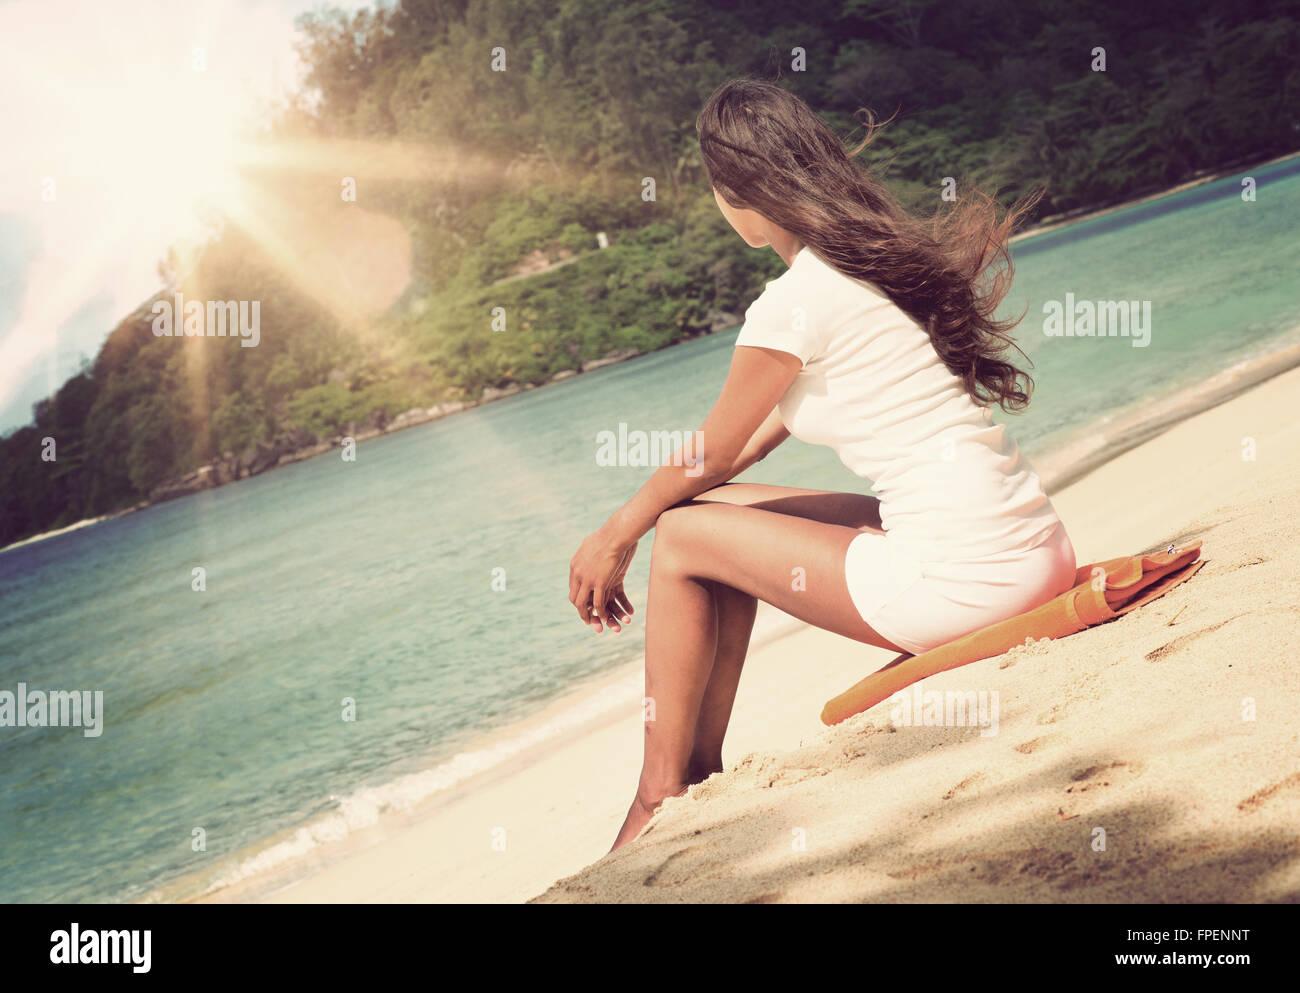 girl sitting on the beach facing the ocean photos girl. Black Bedroom Furniture Sets. Home Design Ideas